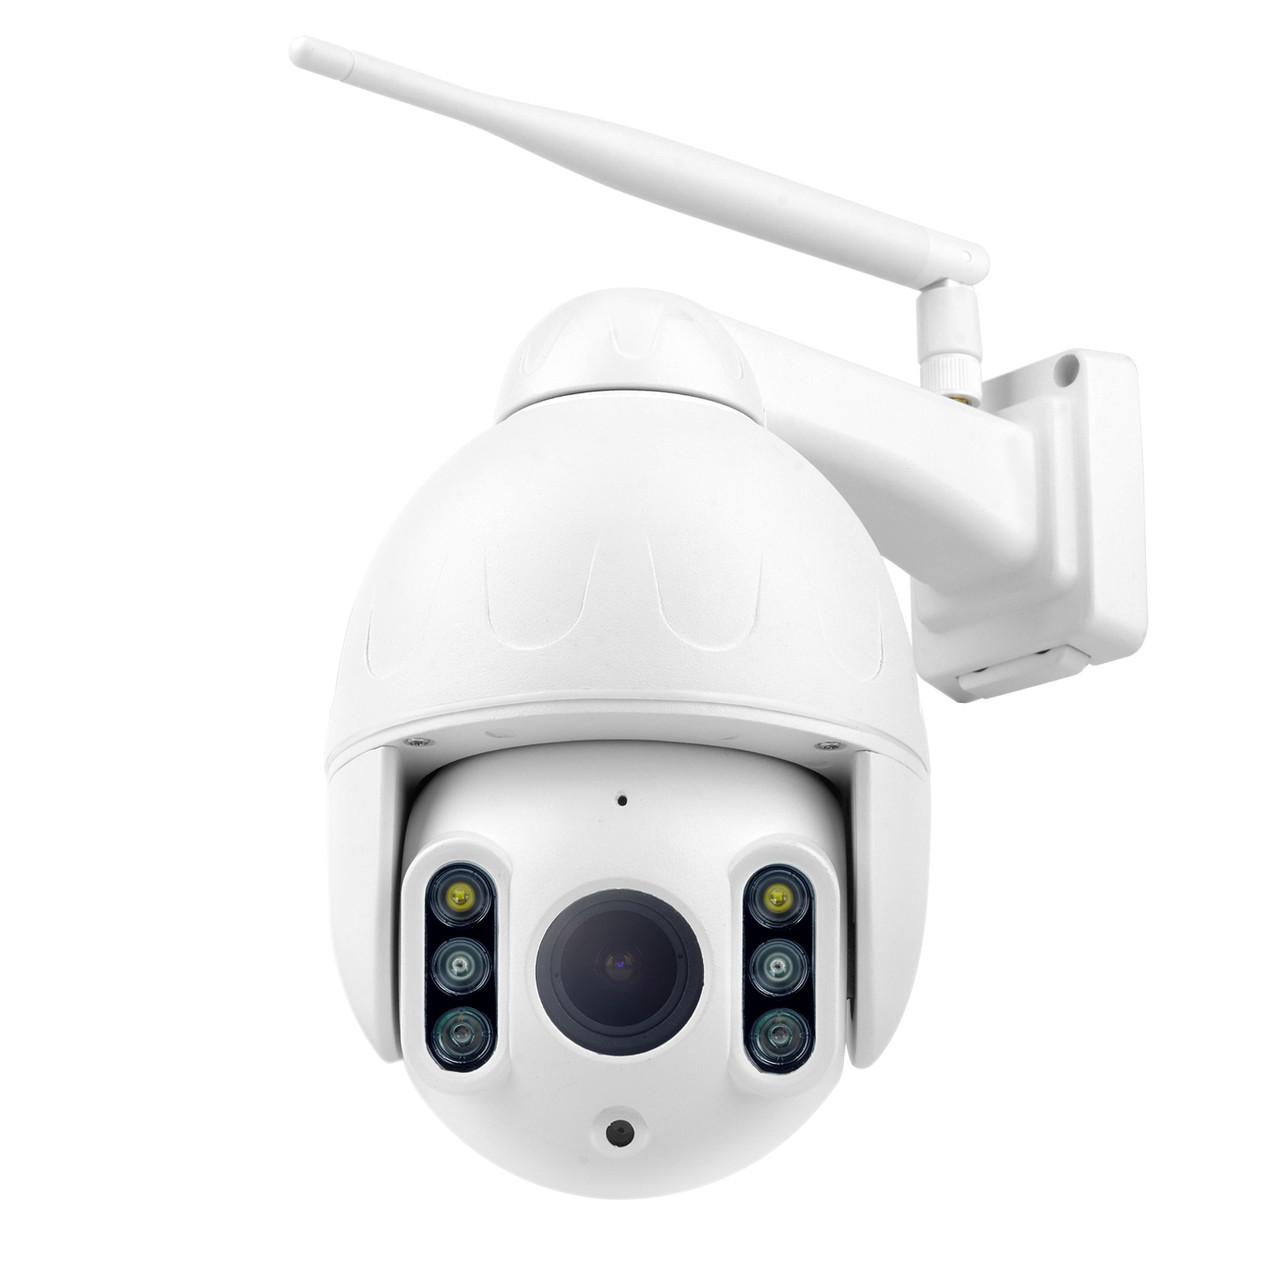 Уличная поворотная WiFi IP камера Wanscam K64A 2 MP Full HD Face Detect